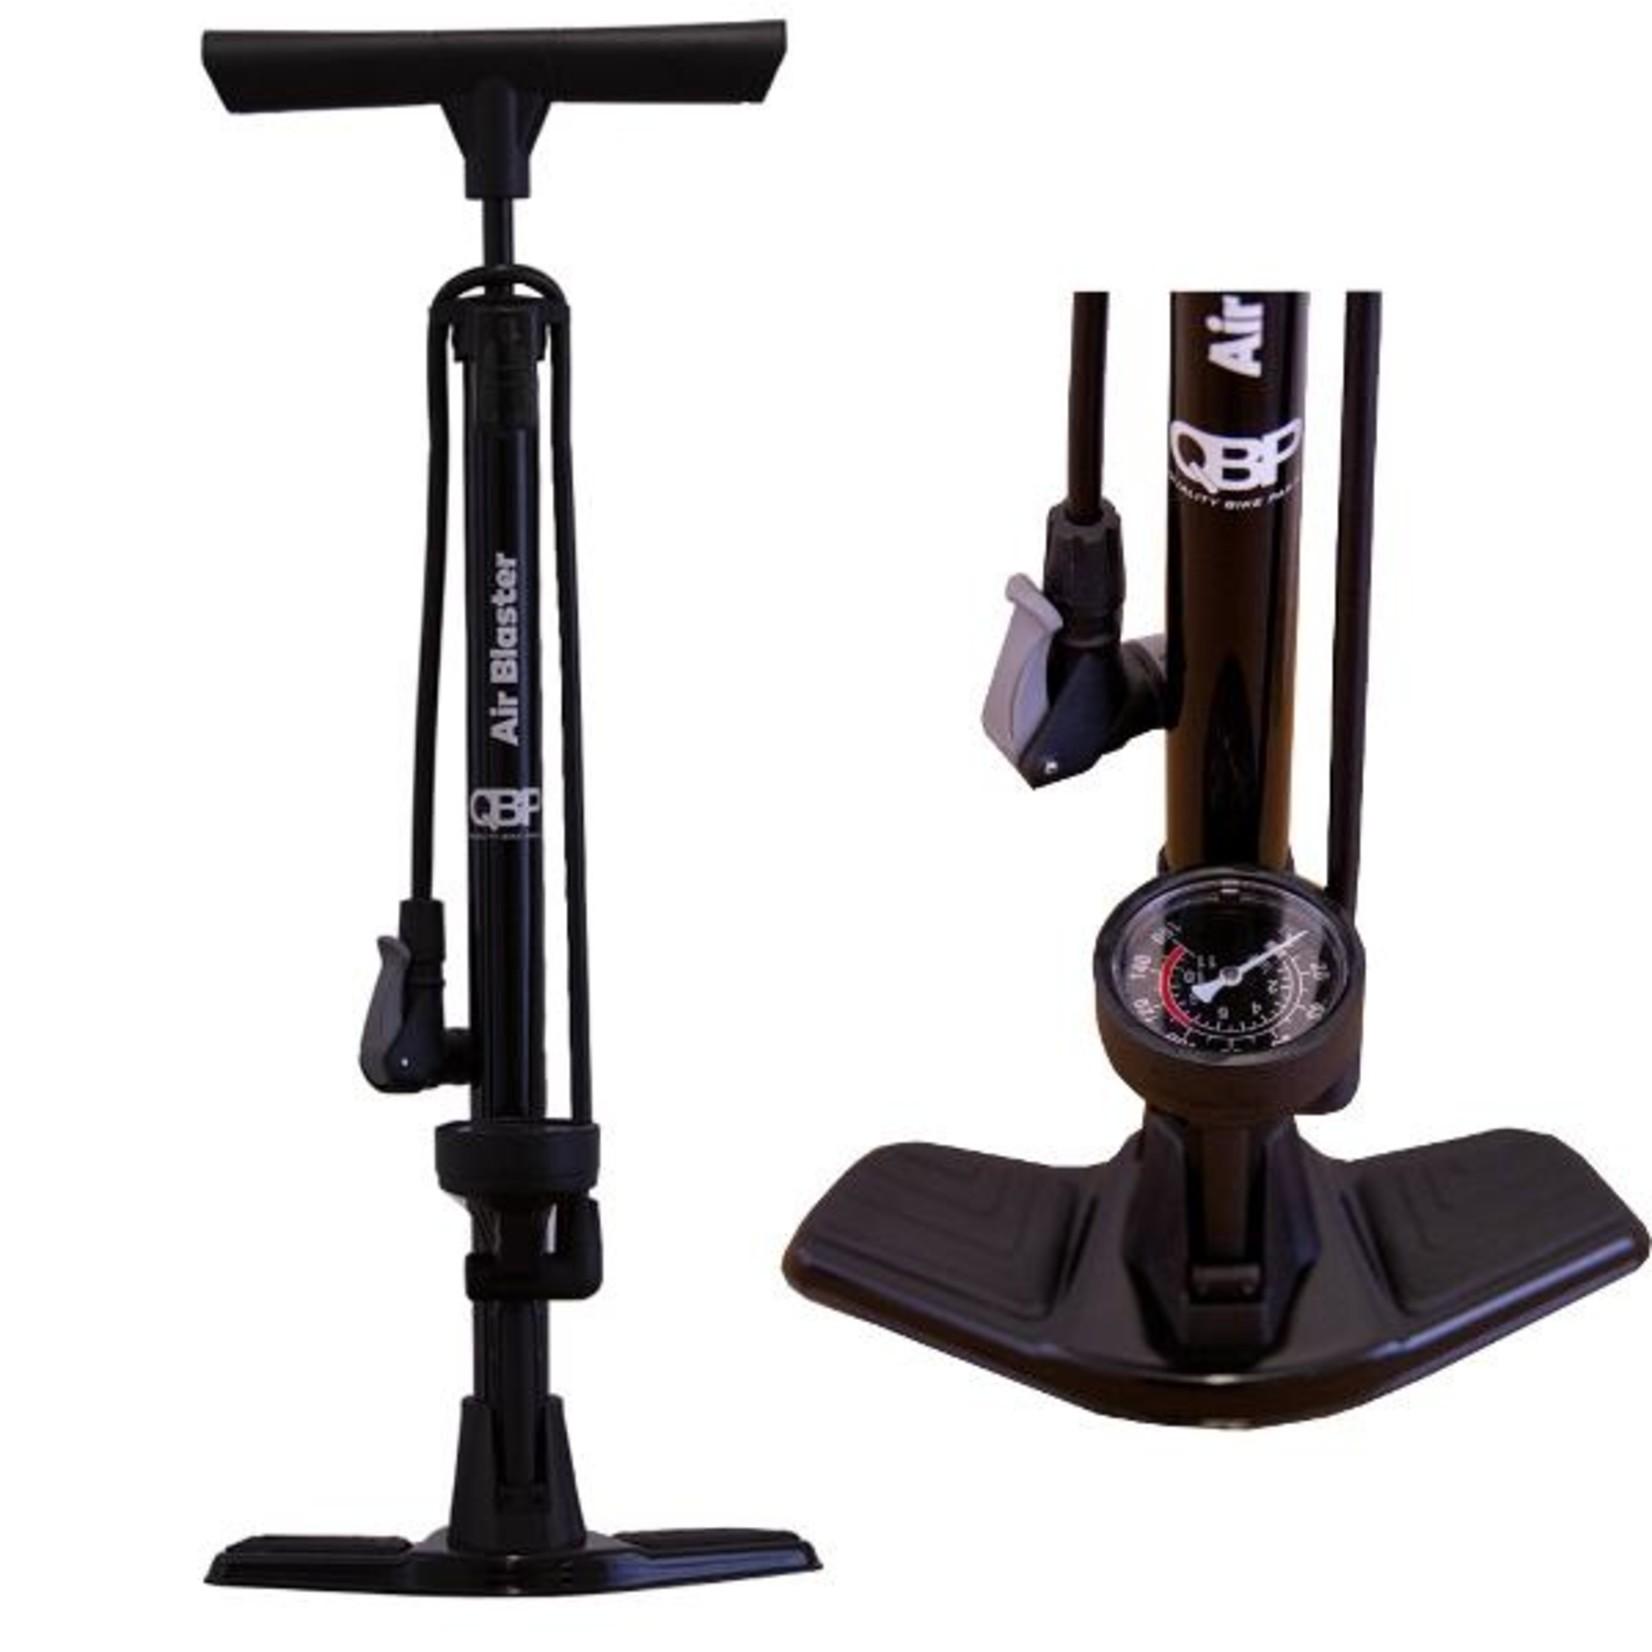 QBP 'Quality Bike Parts' QBP, Air Blaster Floor Pump Black